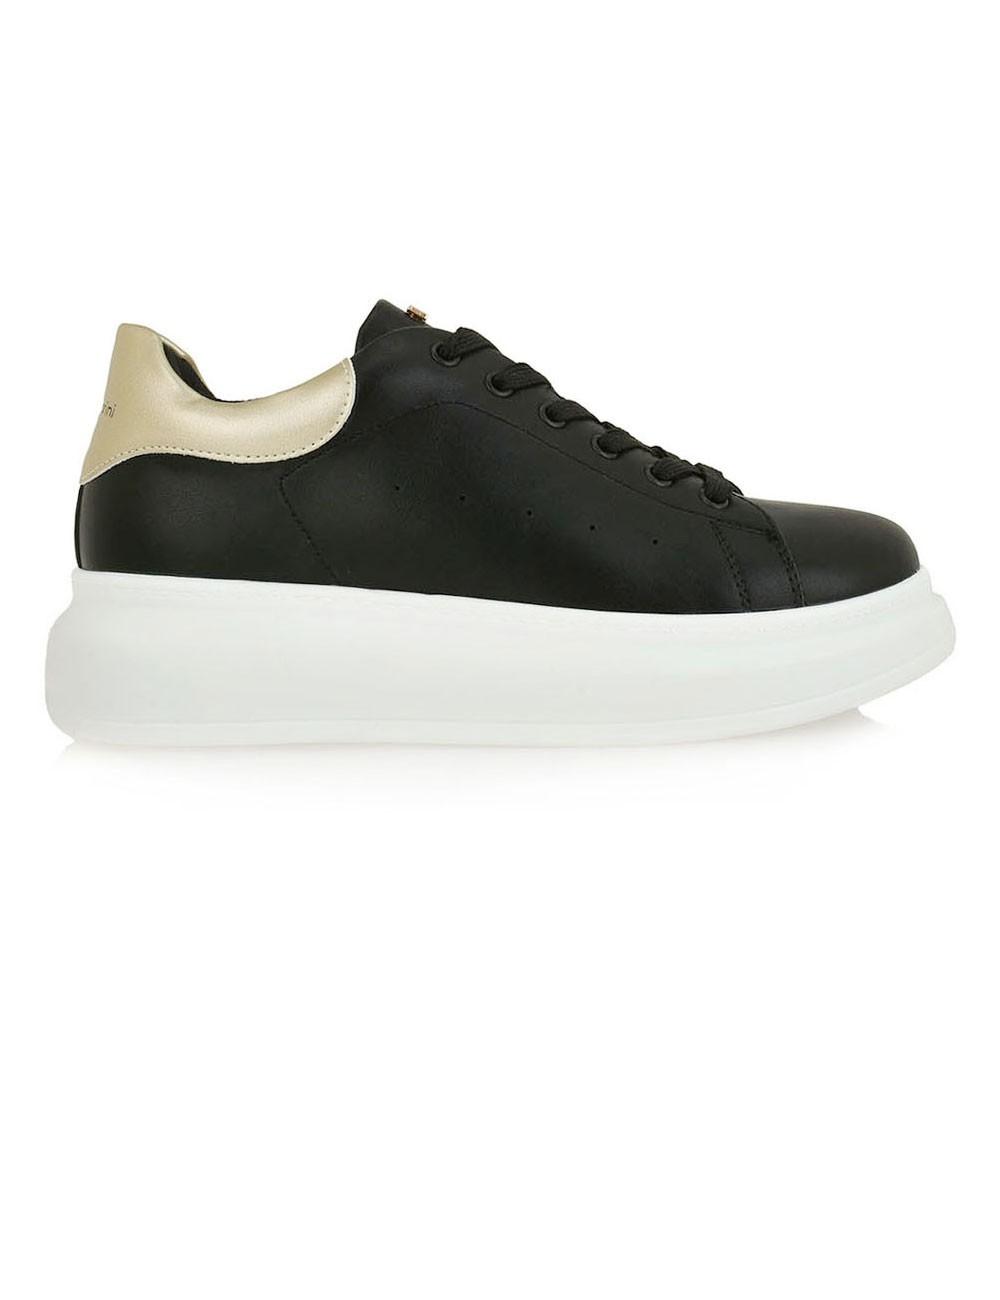 Renato Garini Γυναικεία Παπούτσια Sneakers 101-19R Μαύρο Πλατίνα ΜΑΤ N119R1012T12